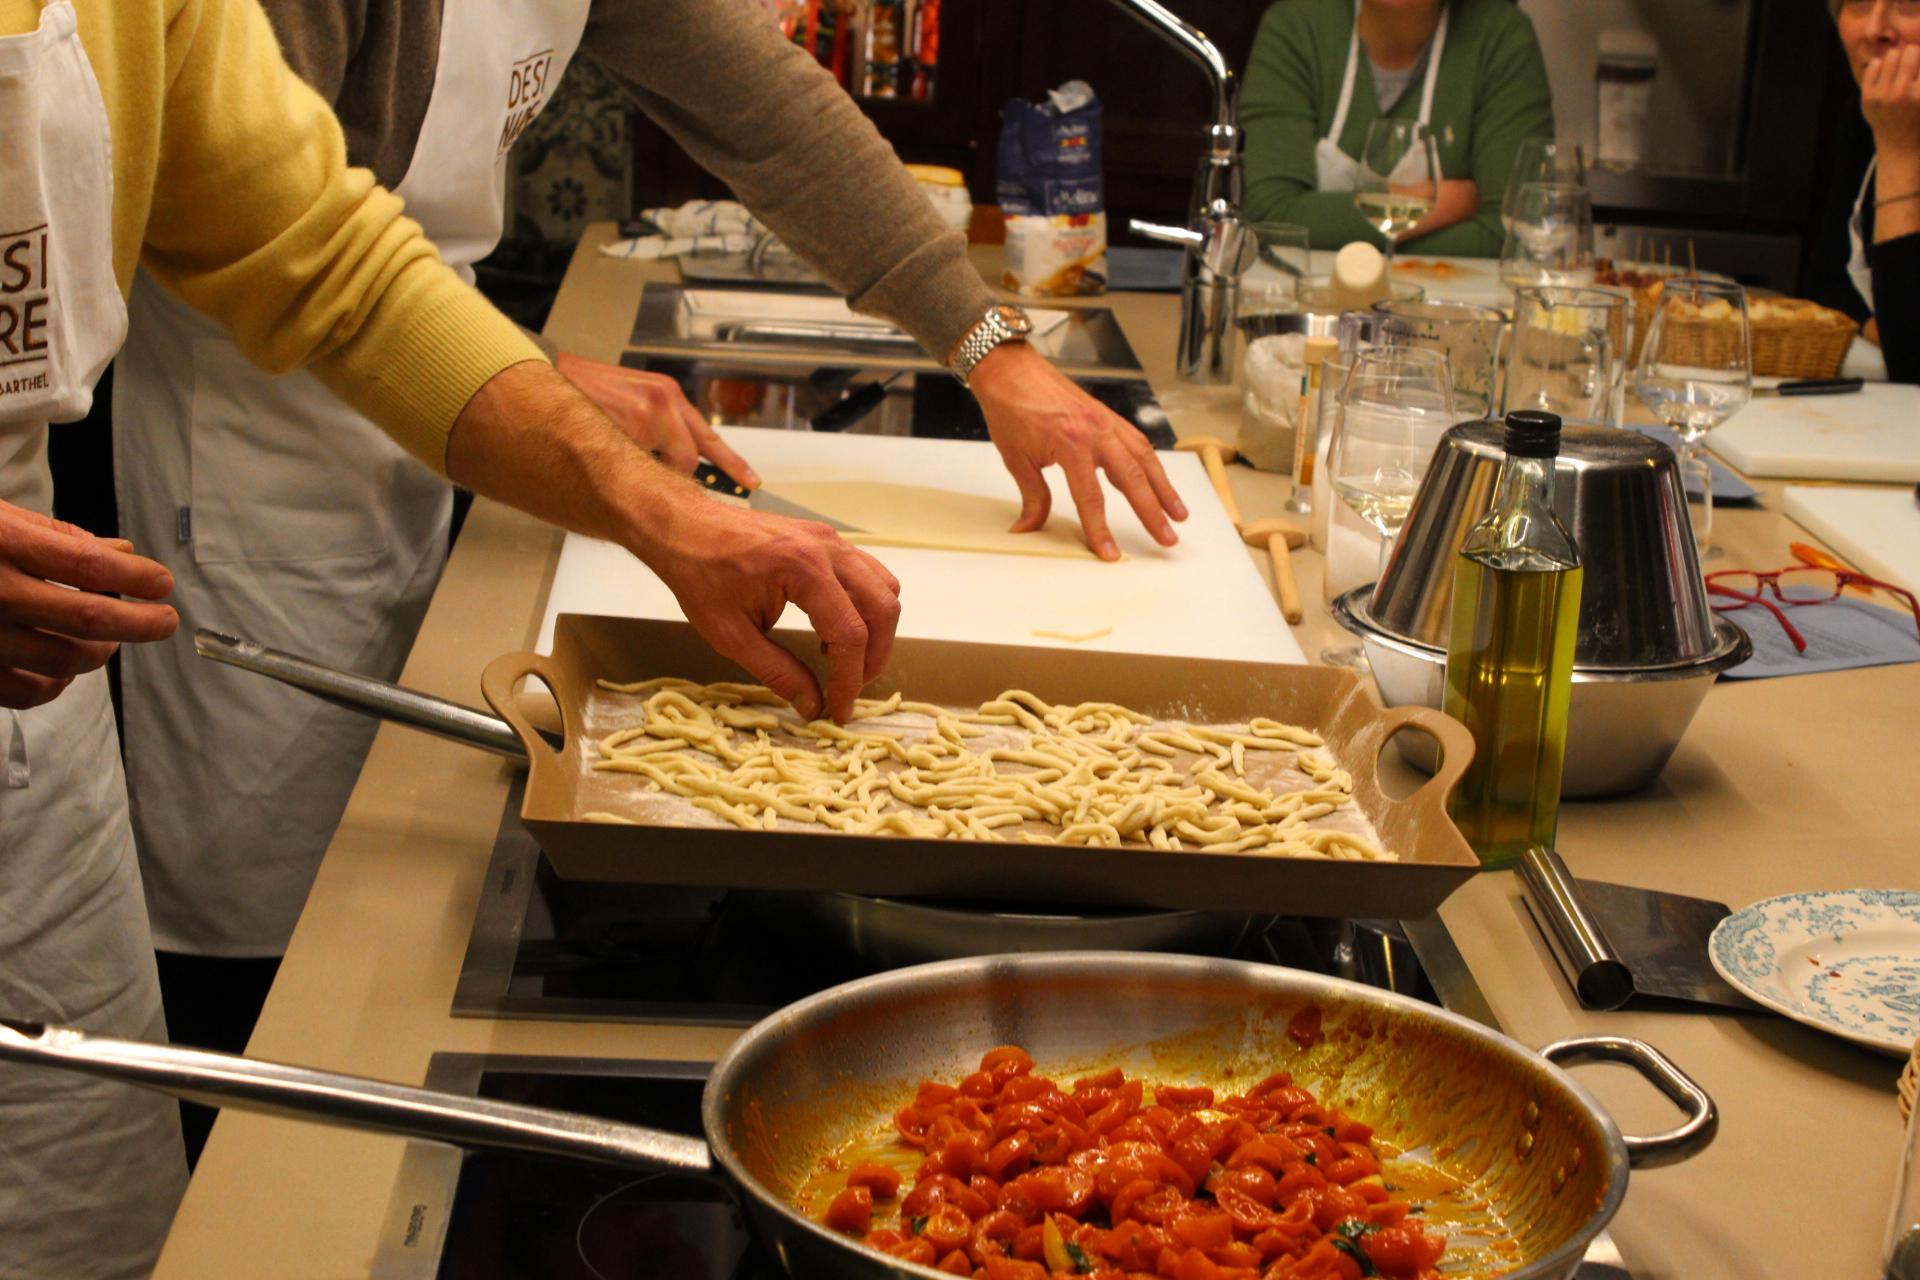 Making pasta at Desinare cooking school